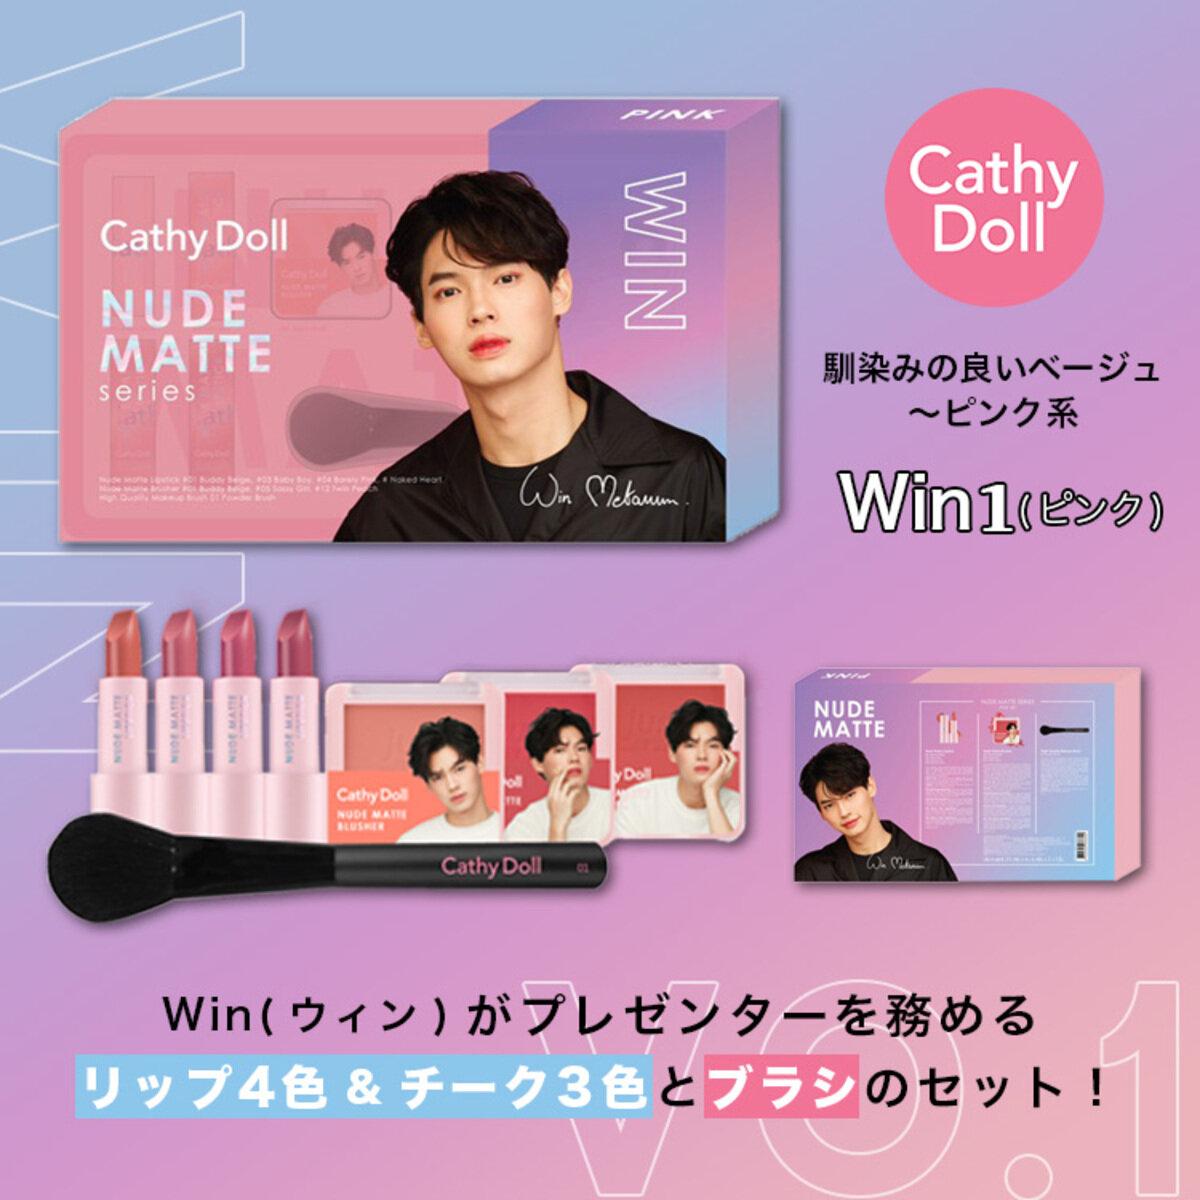 CathyDoll プレミアムセット Win1(ピンク)